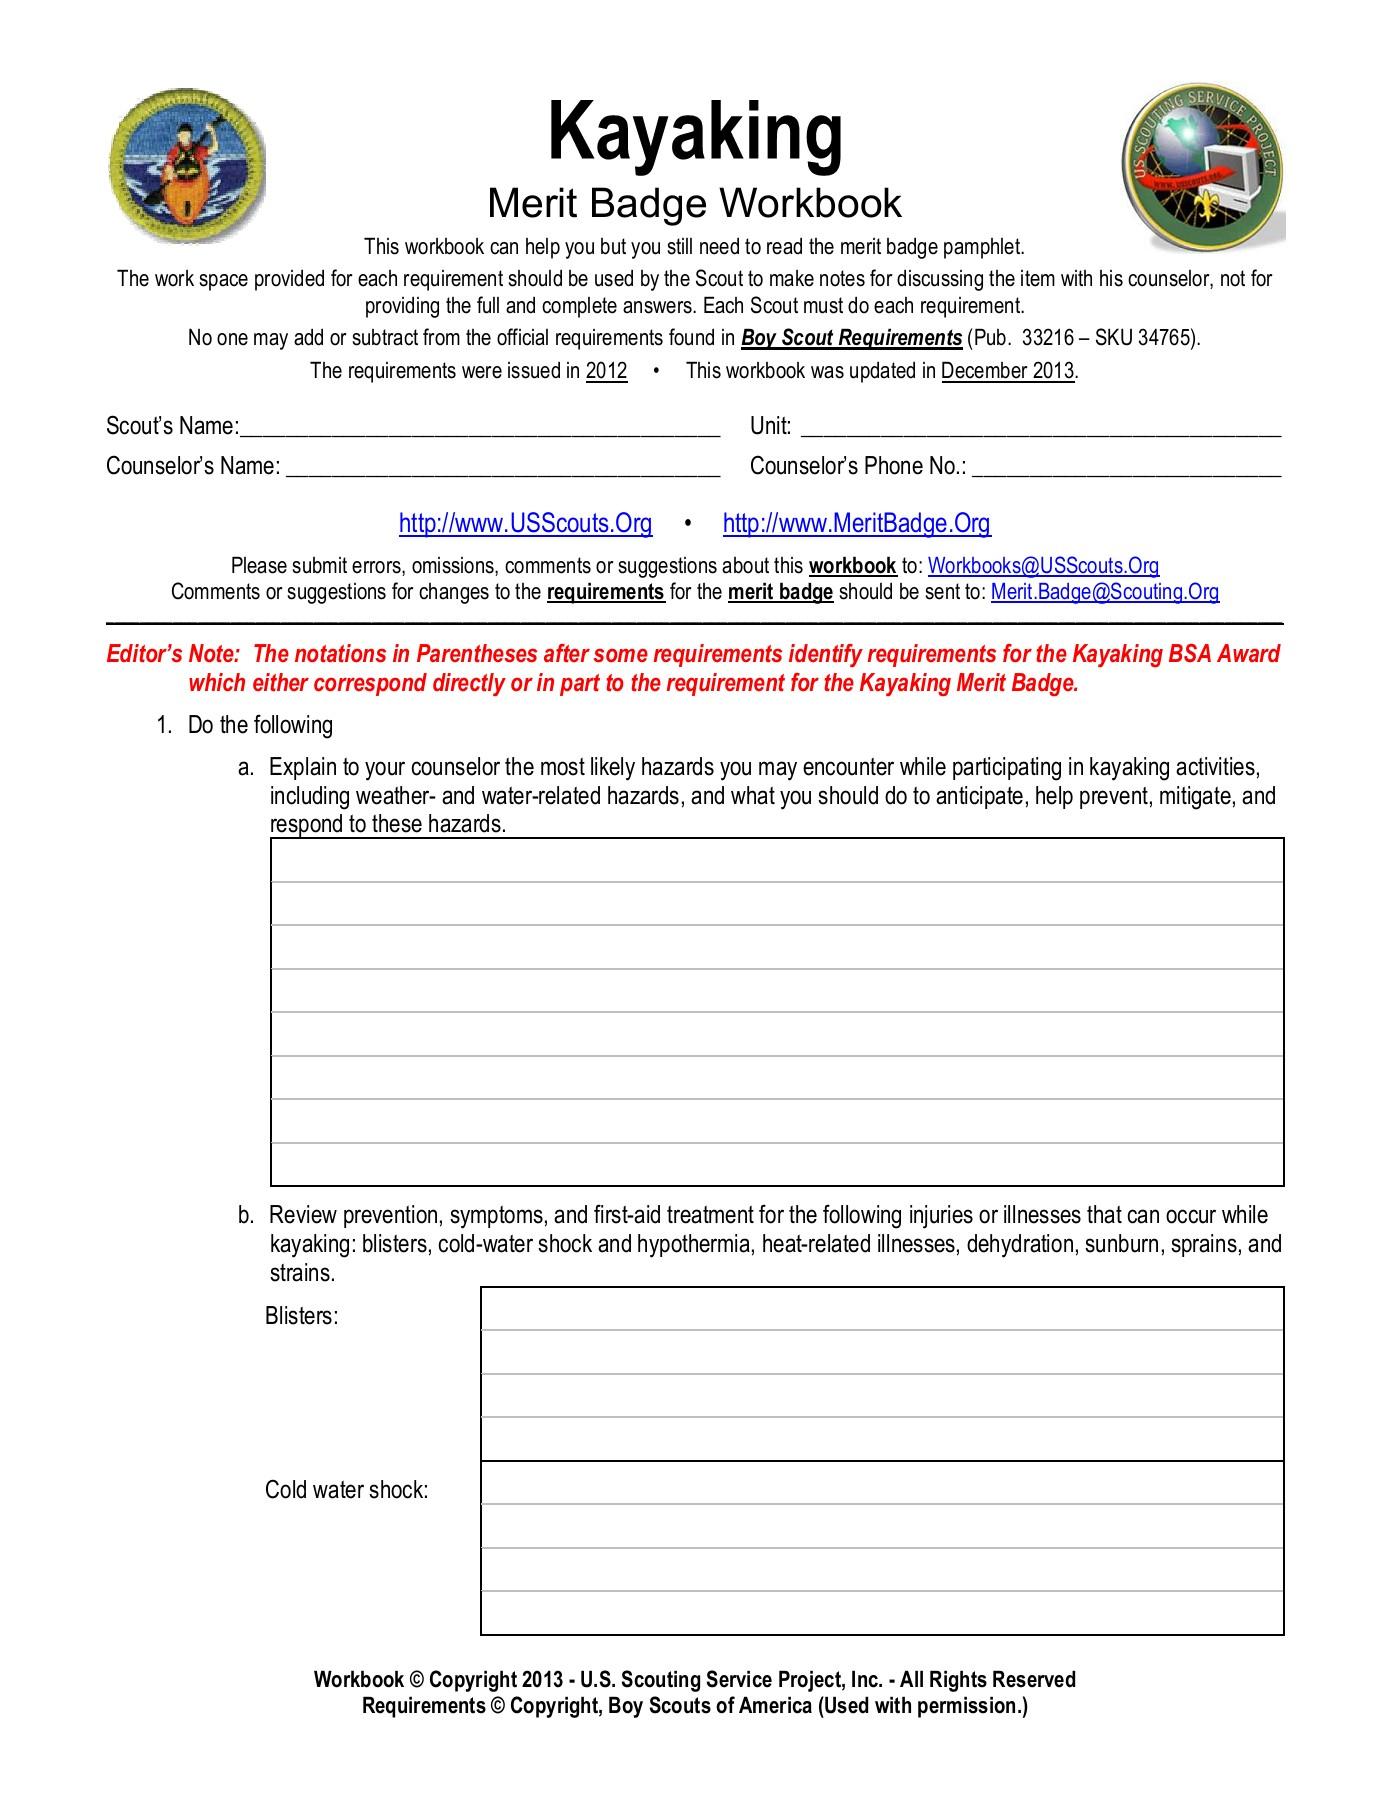 Personal Fitness Merit Badge Workbook